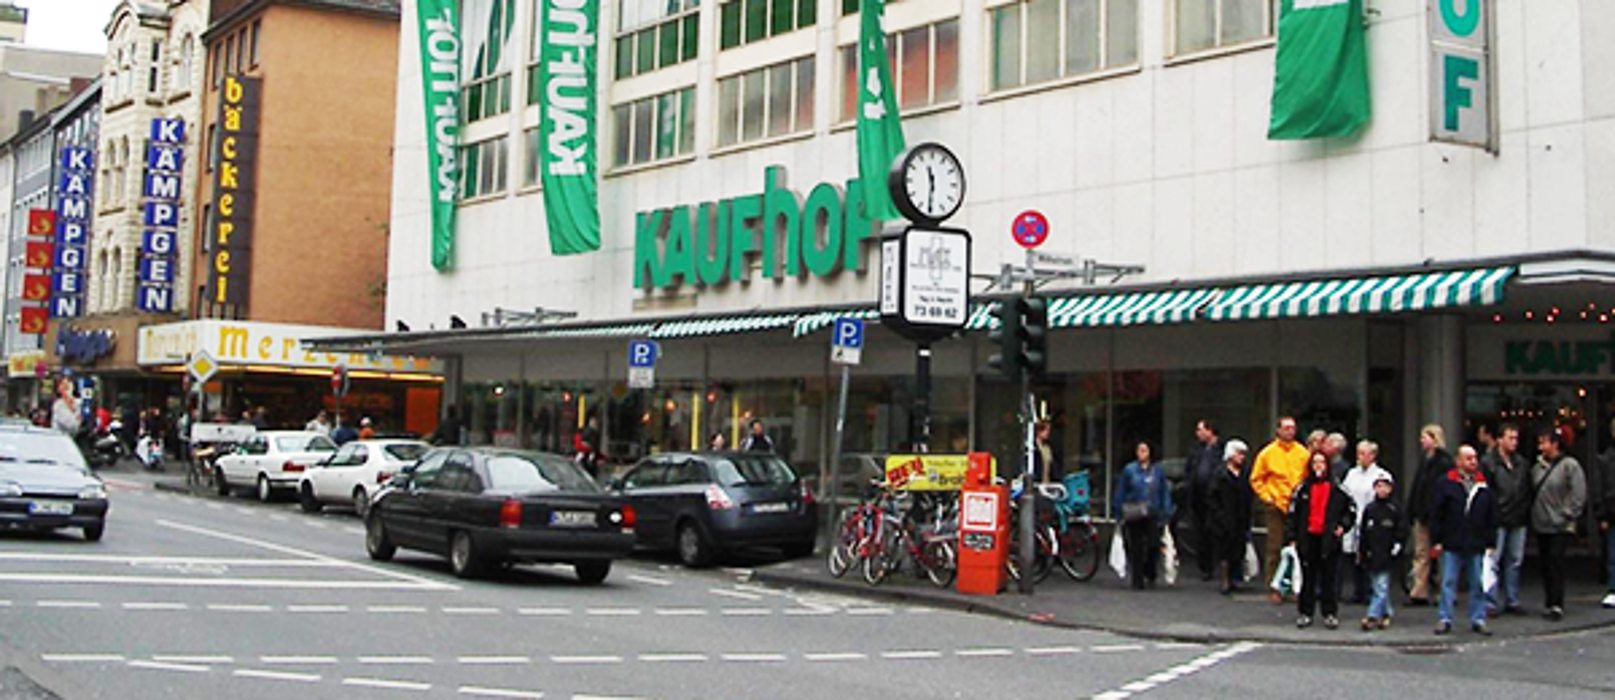 GALERIA (Kaufhof) Köln Nippes, Neusser Straße in Köln